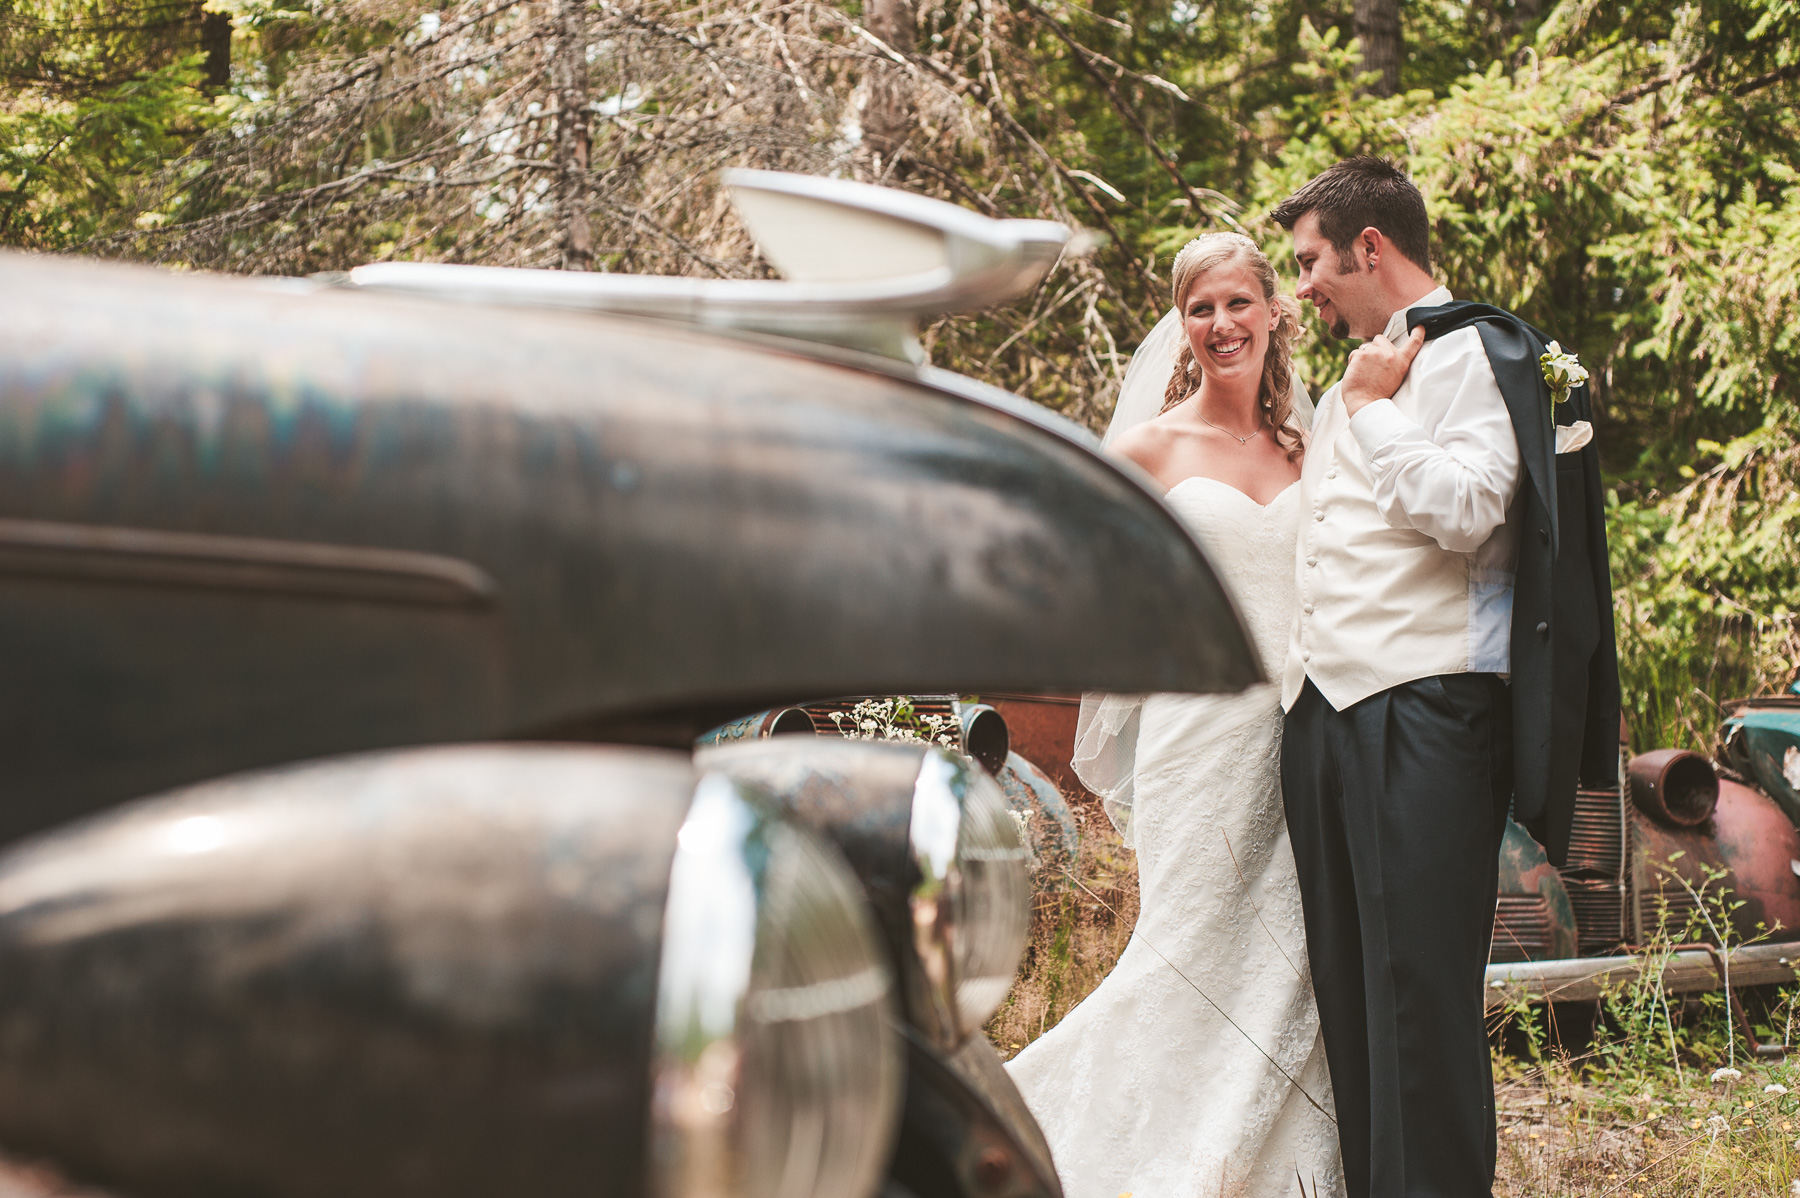 Victoria-BC-Wedding-Photography-12.jpg